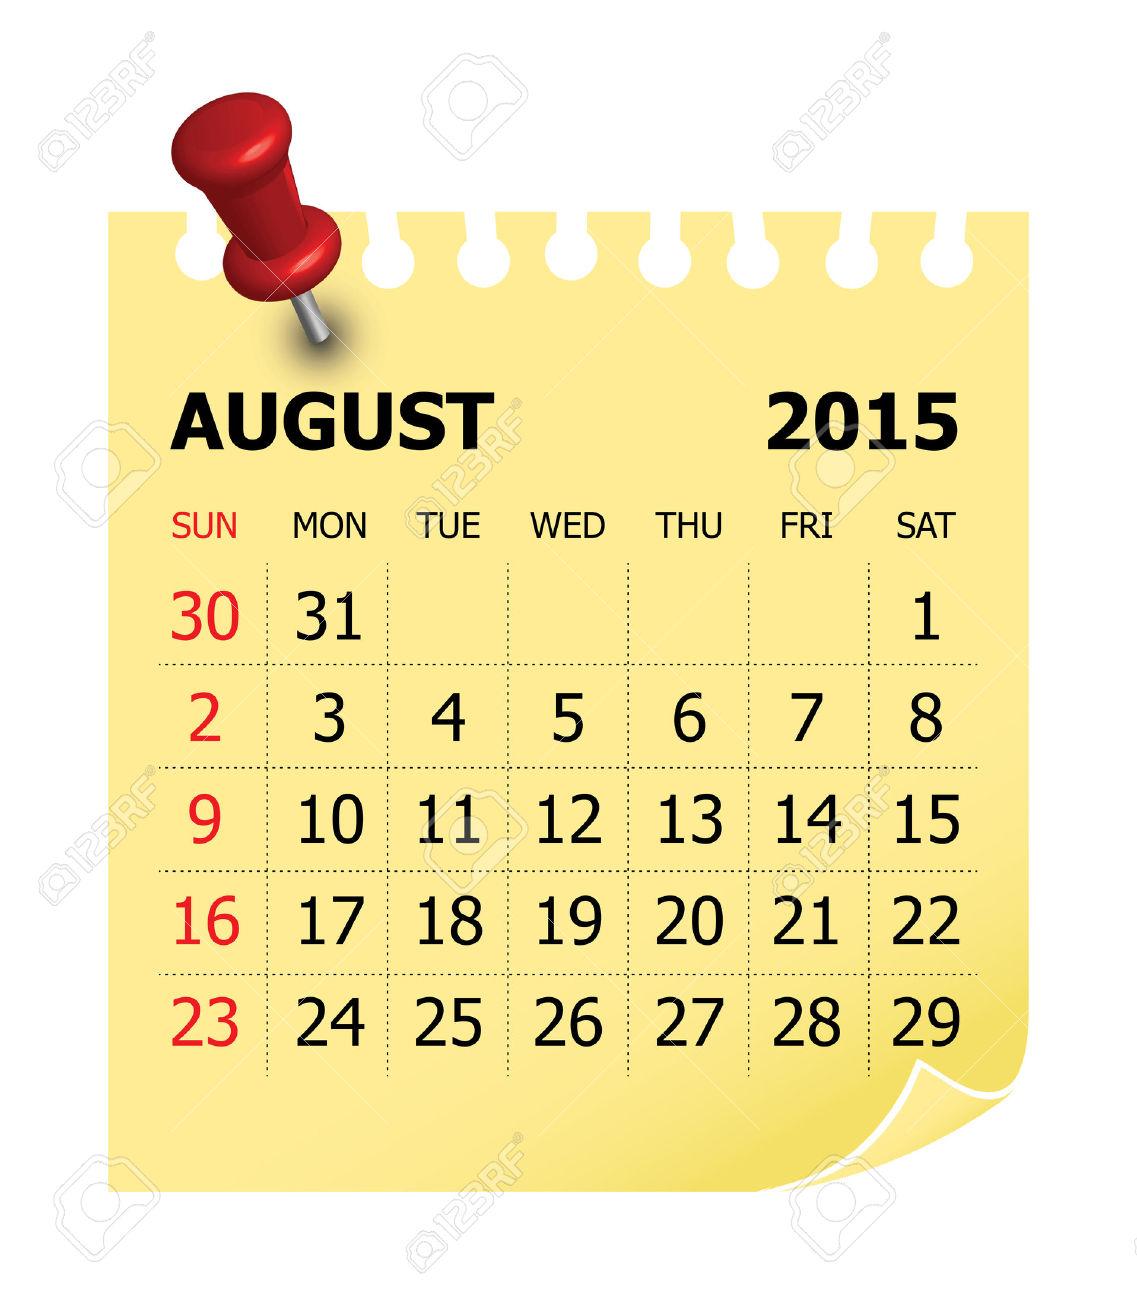 Clipart calendar august 2015 vector royalty free library Simple Calendar For August 2015 Royalty Free Cliparts, Vectors ... vector royalty free library